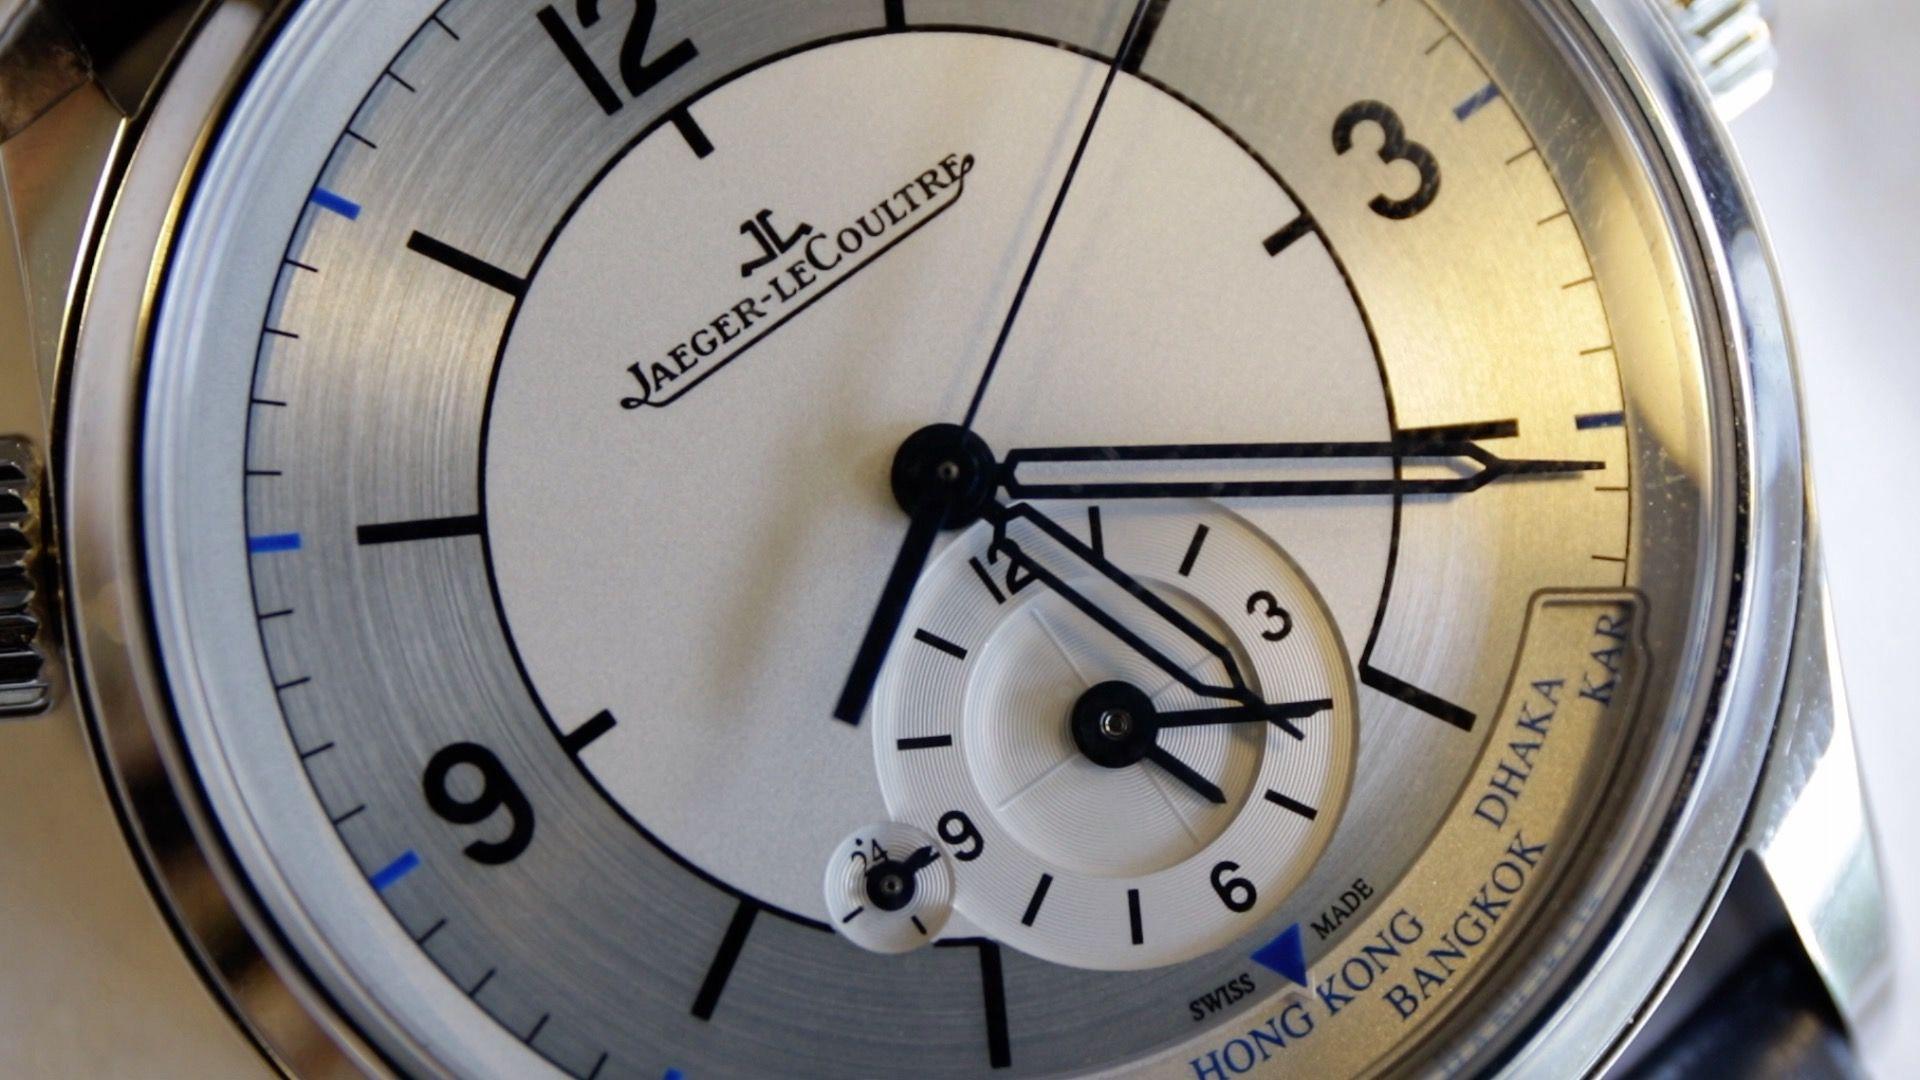 The Watch Professor: Automatic vs. Manual Winding